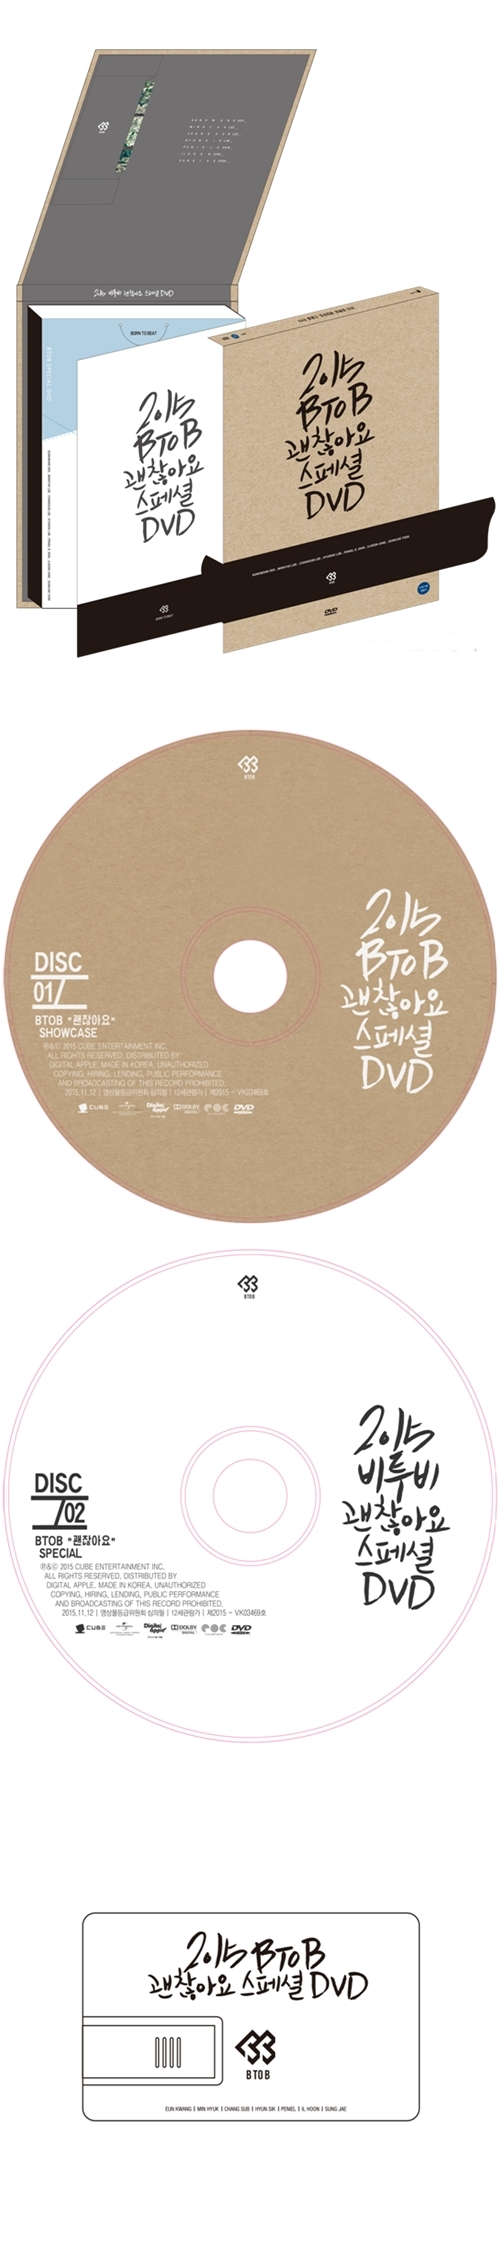 btob_imfine_dvd